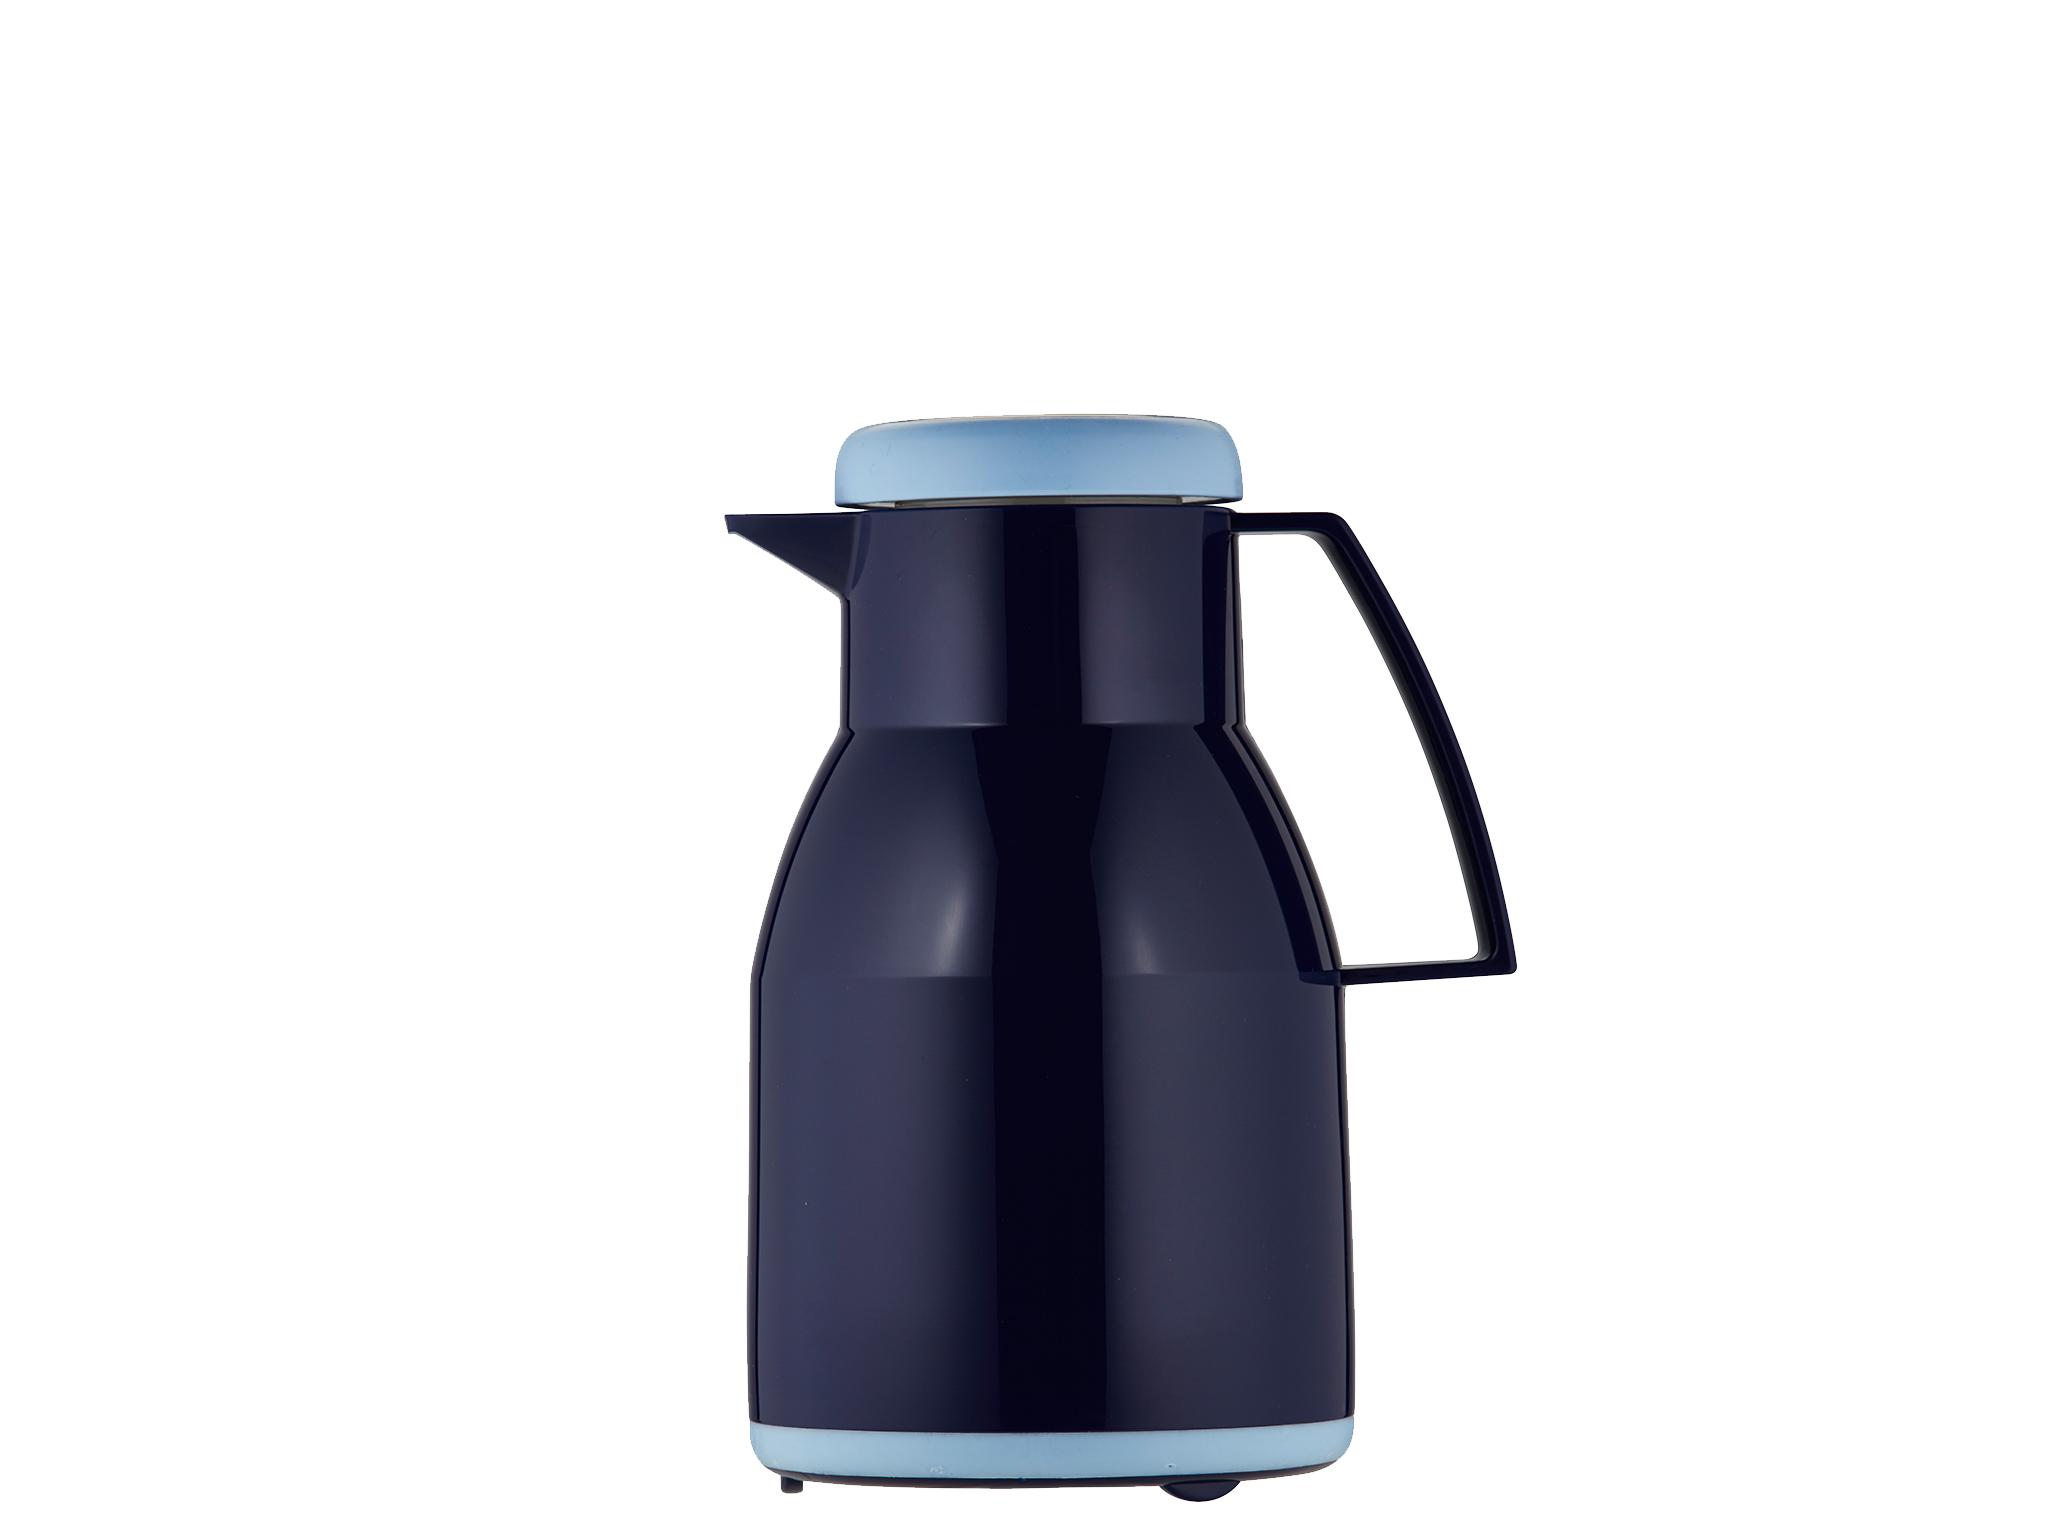 2764-008 - Vacuum carafe onbreakable blue 1.0 L WASH S+ - Helios